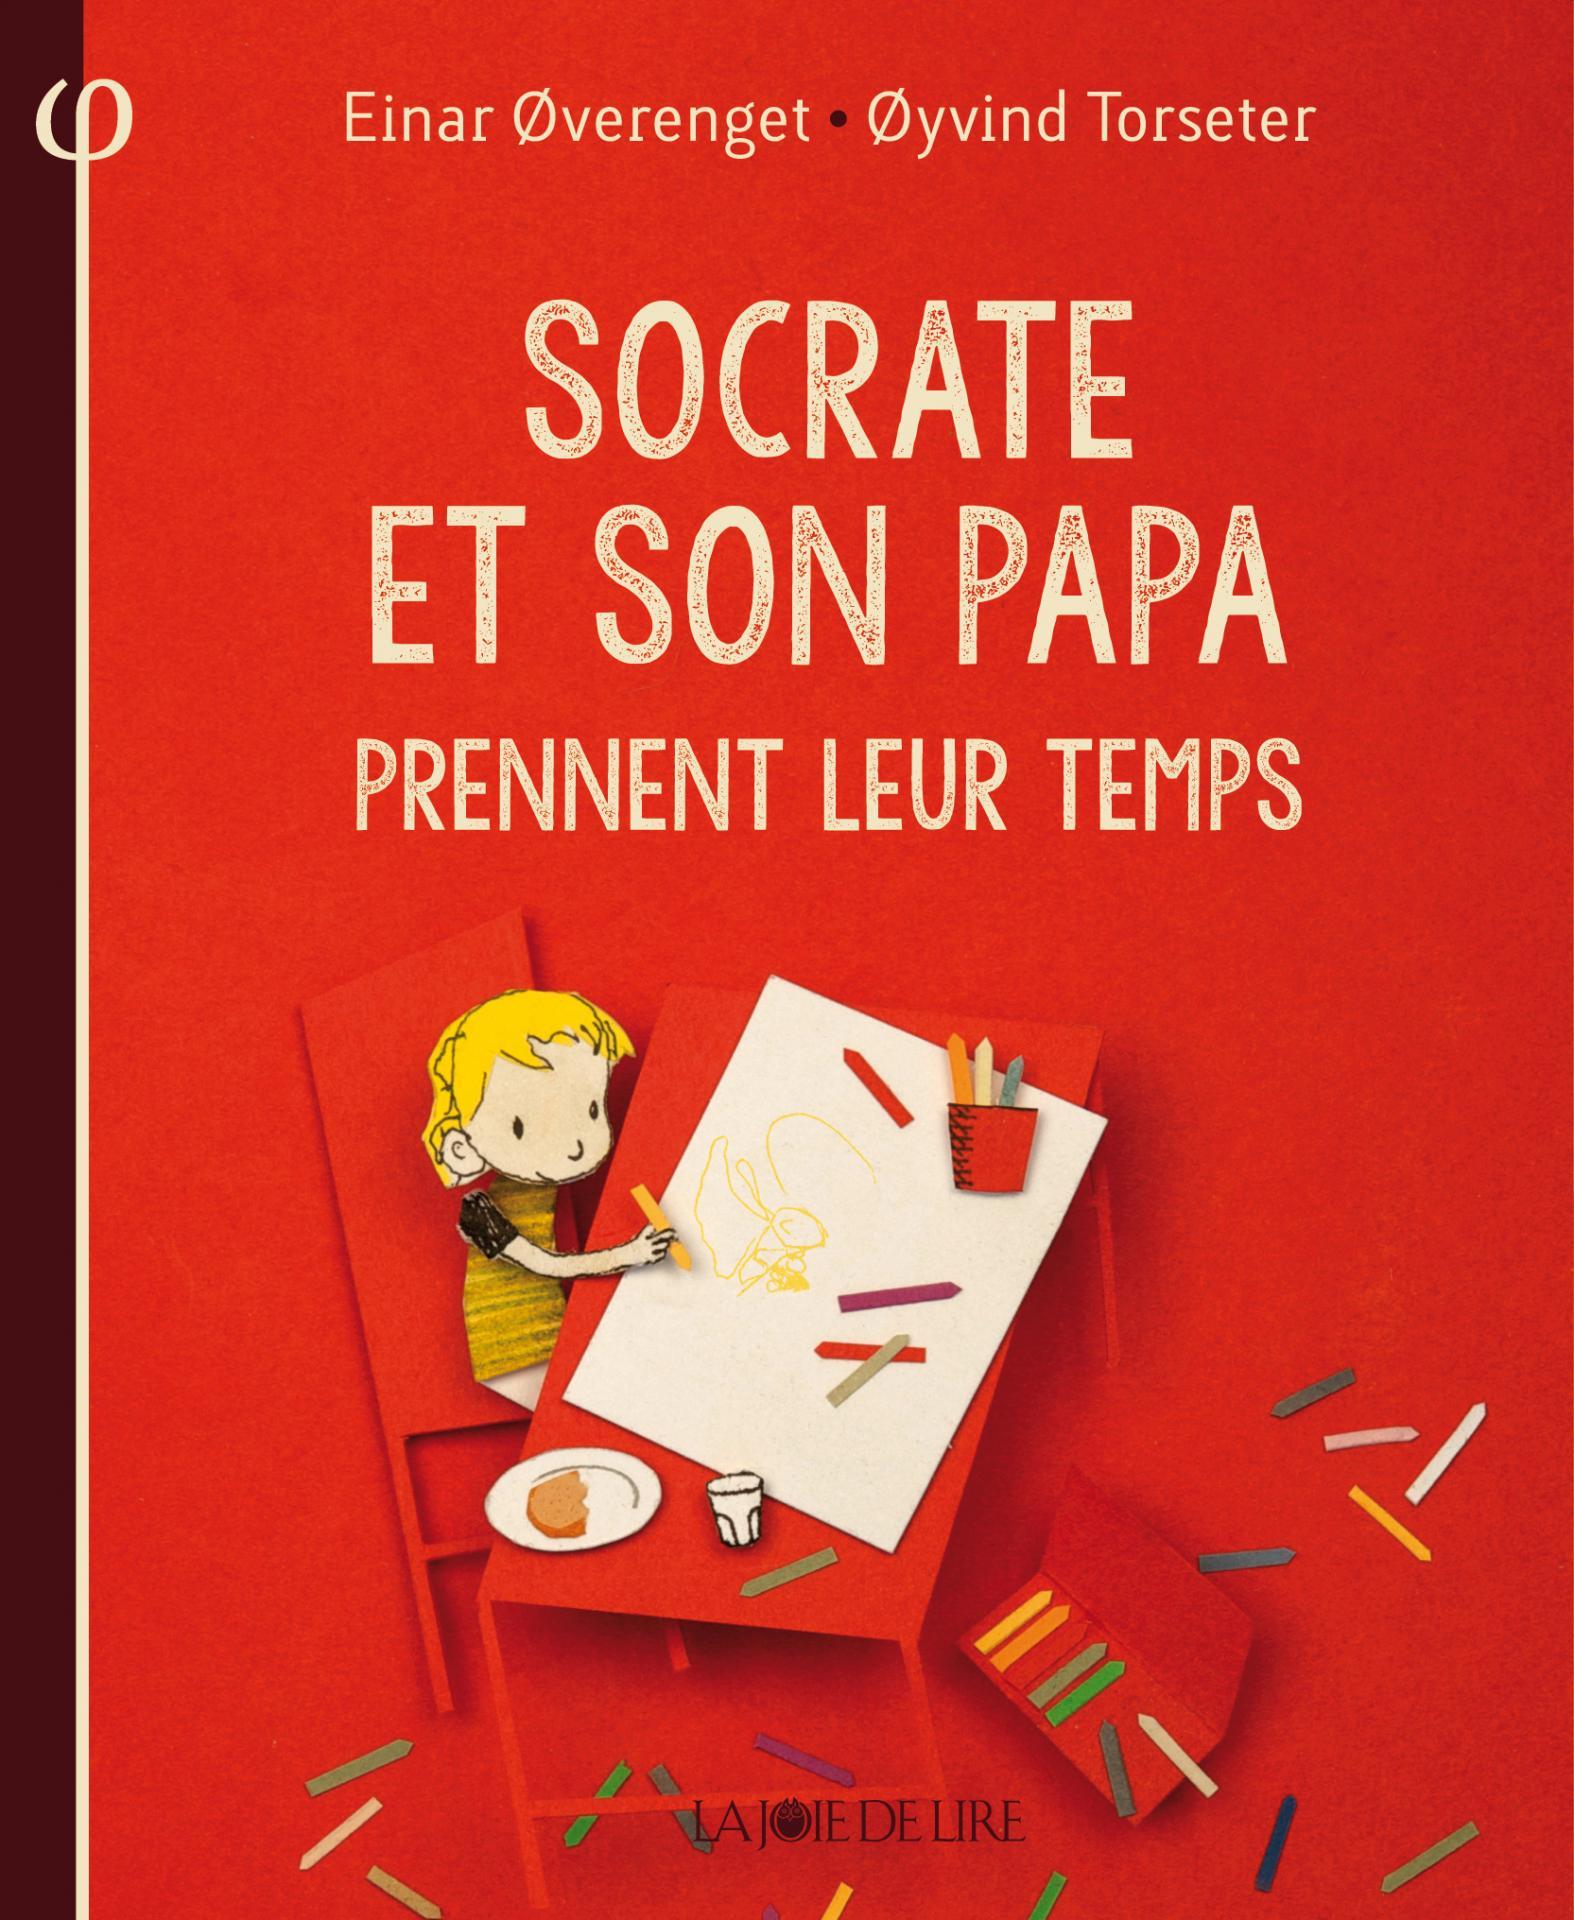 Socrate et son papa prennent leur temps - Einar Øverenget